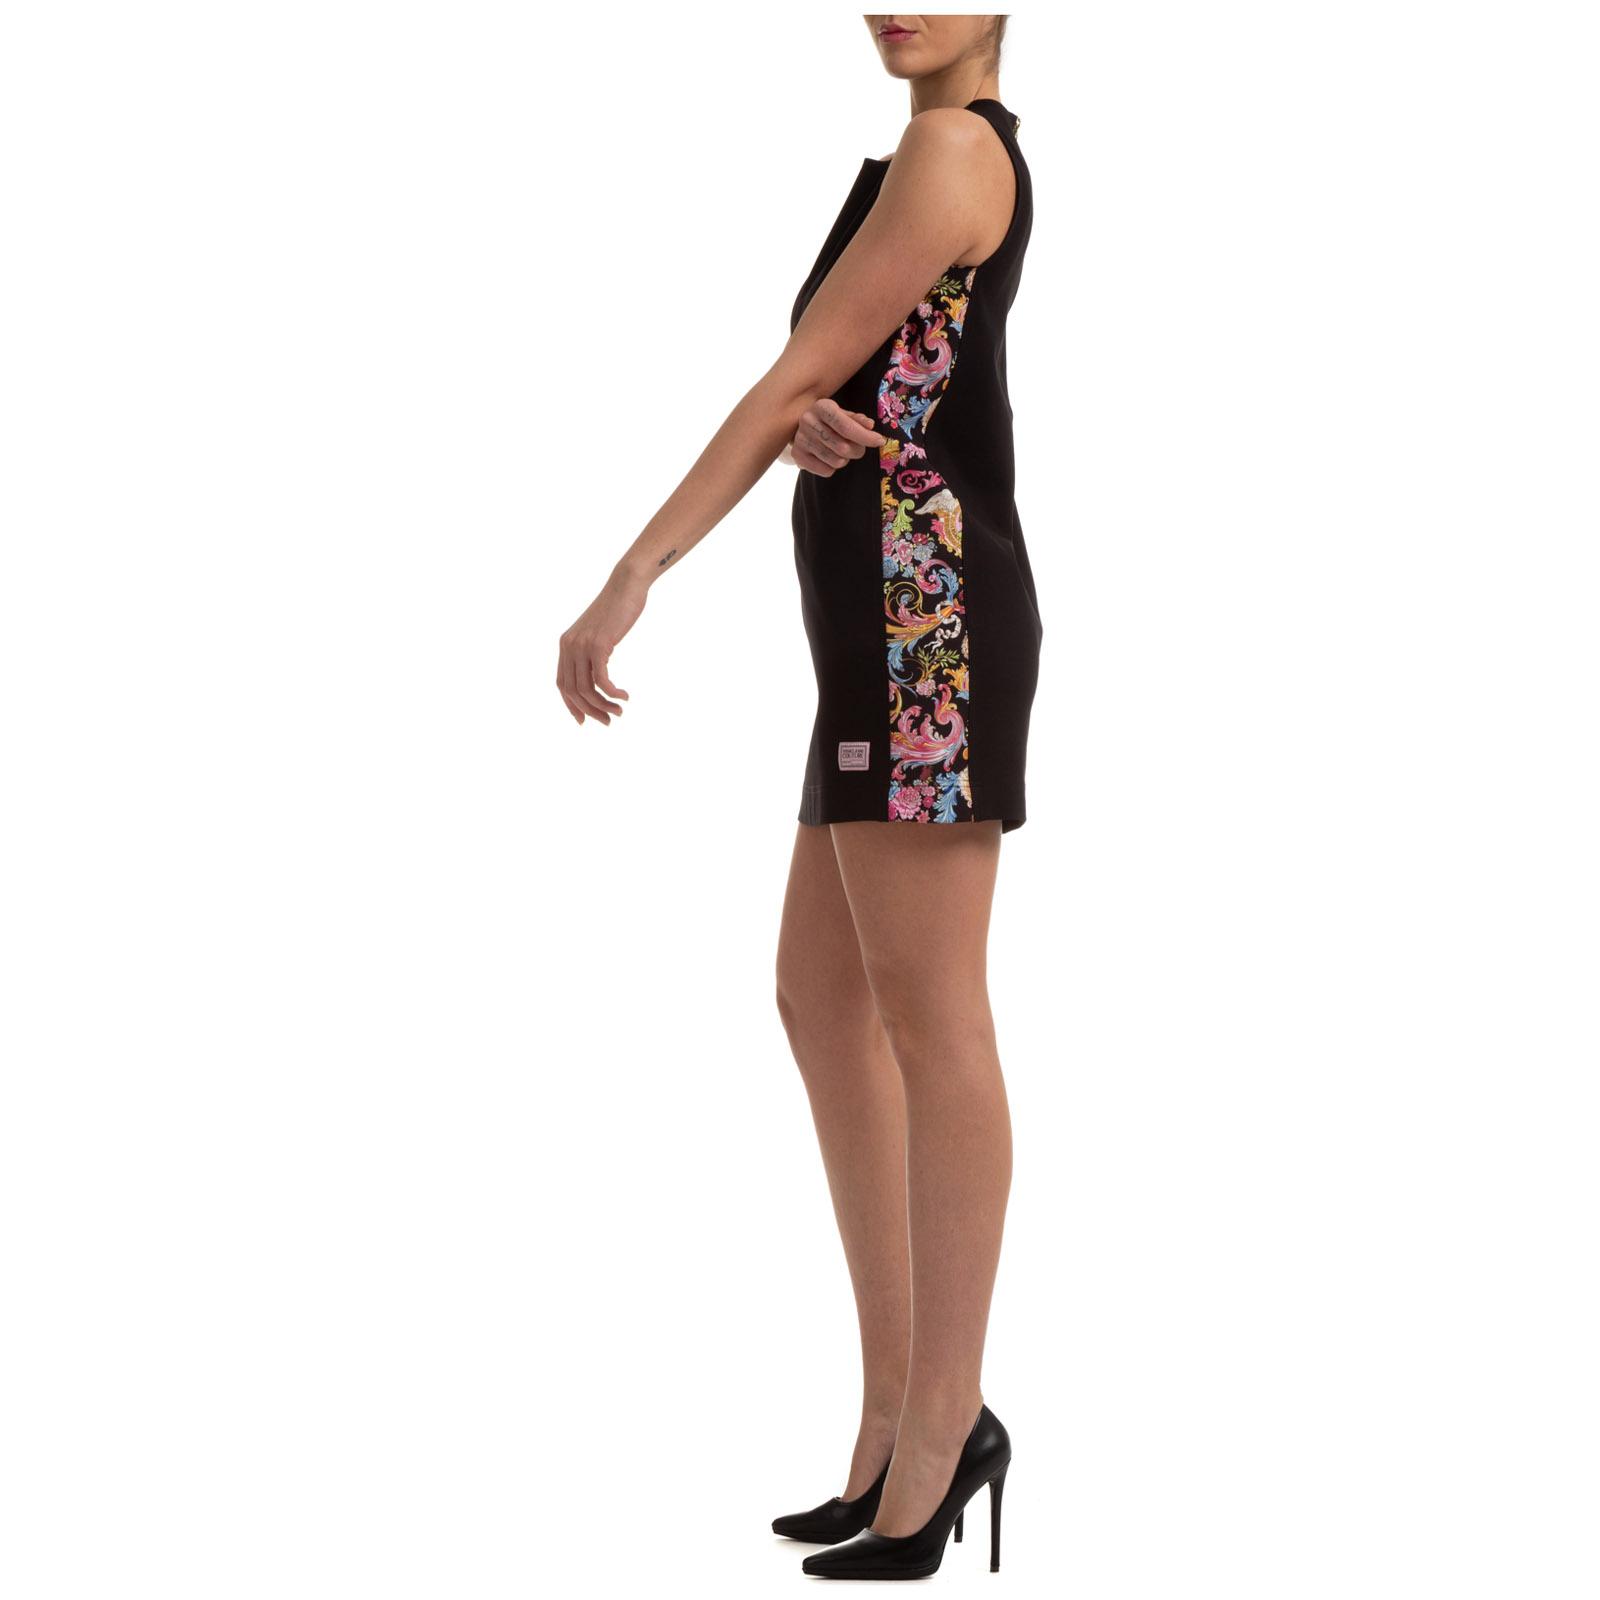 Minikleid Versace Jeans Couture Baroque Ed2hwa433 E11708 E899 Nero Frmoda Com